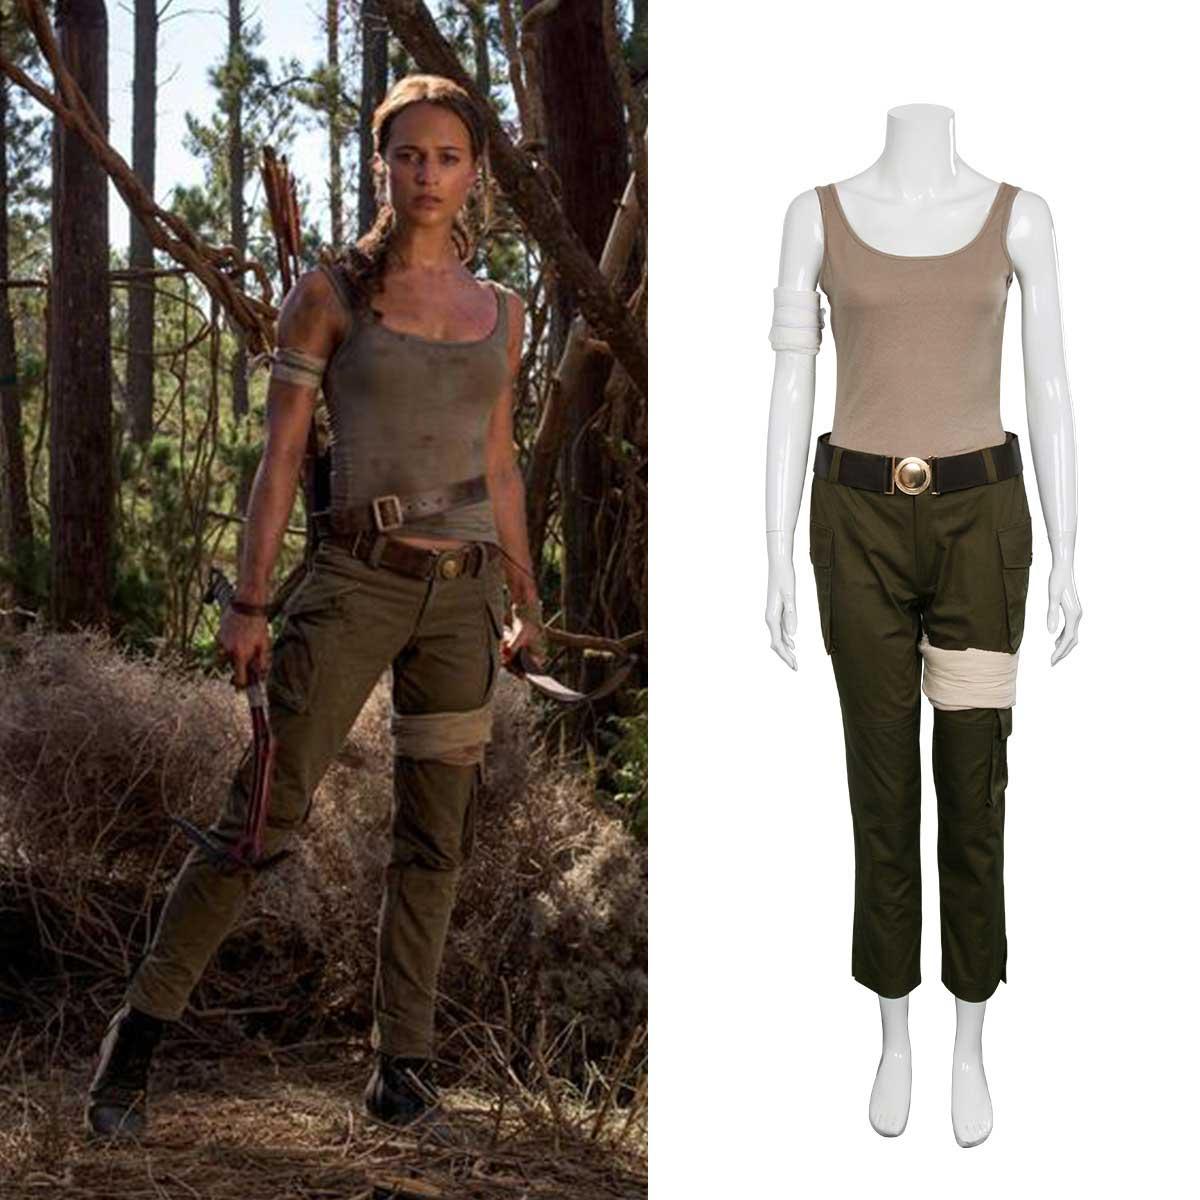 2018 Movie Tomb Raider Lara Croft Outfit Cosplay Costume